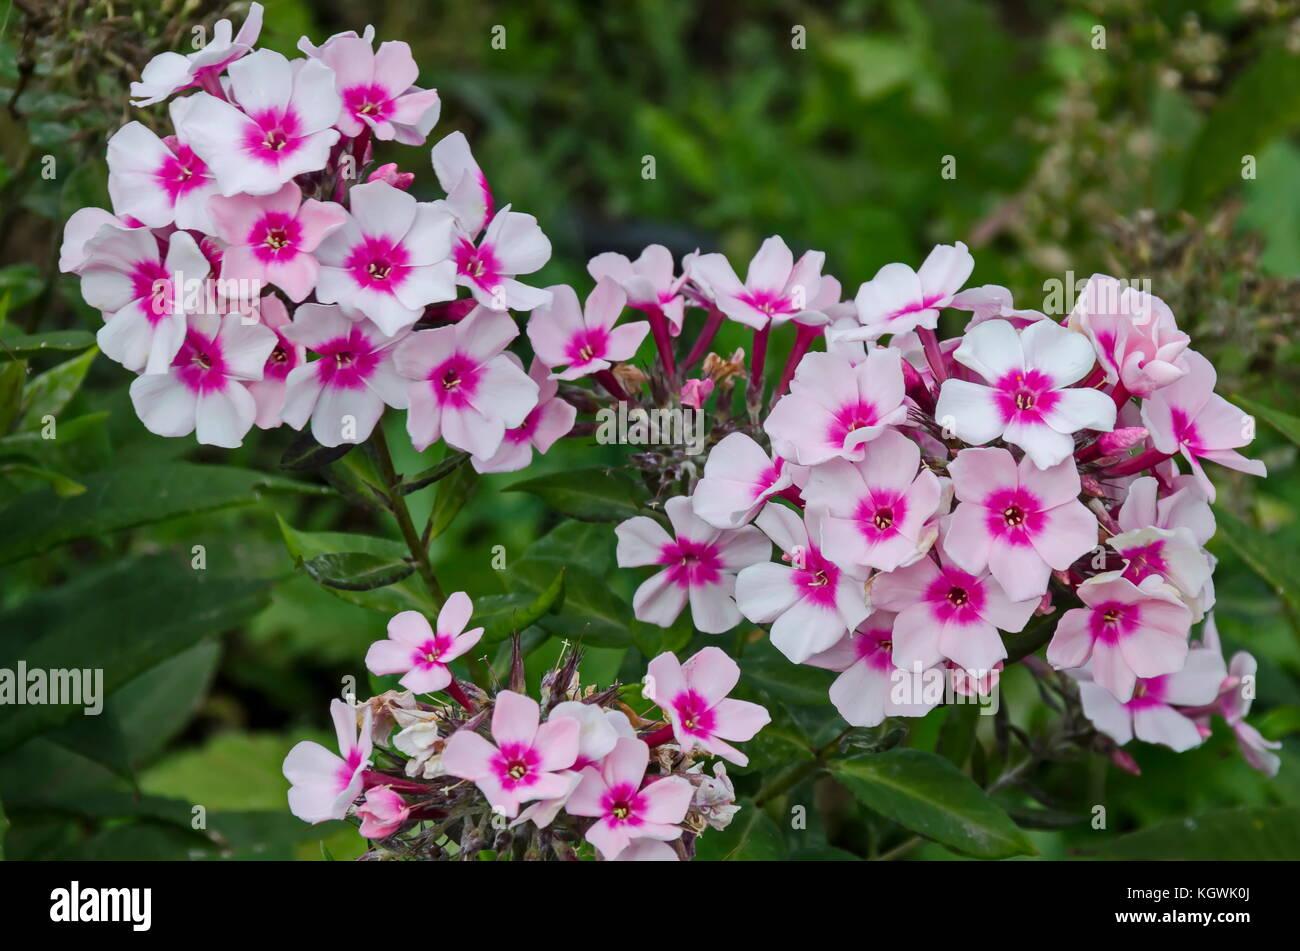 Pink phlox paniculata flower in full bloom at perennial garden stock pink phlox paniculata flower in full bloom at perennial garden sofia bulgaria mightylinksfo